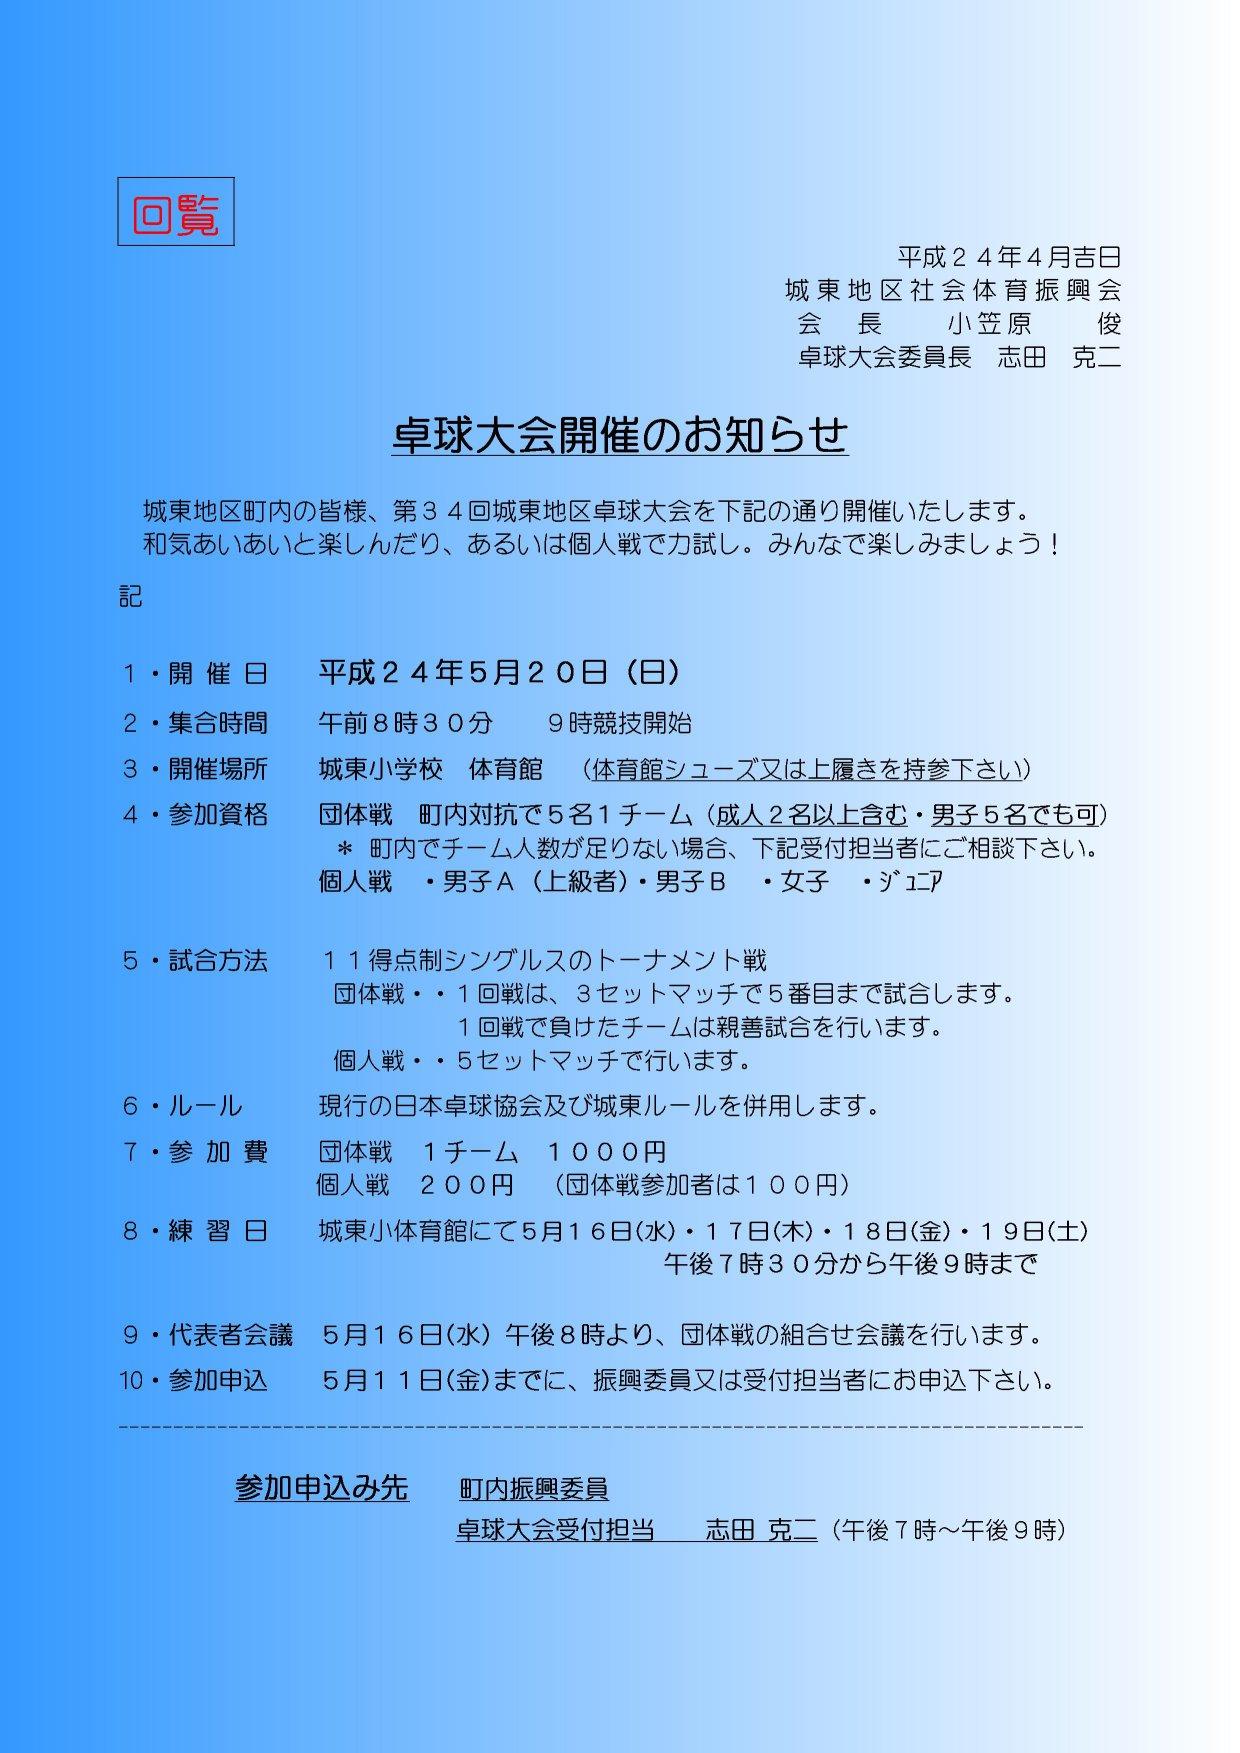 S 2012 卓球大会 HPご案内.jpg